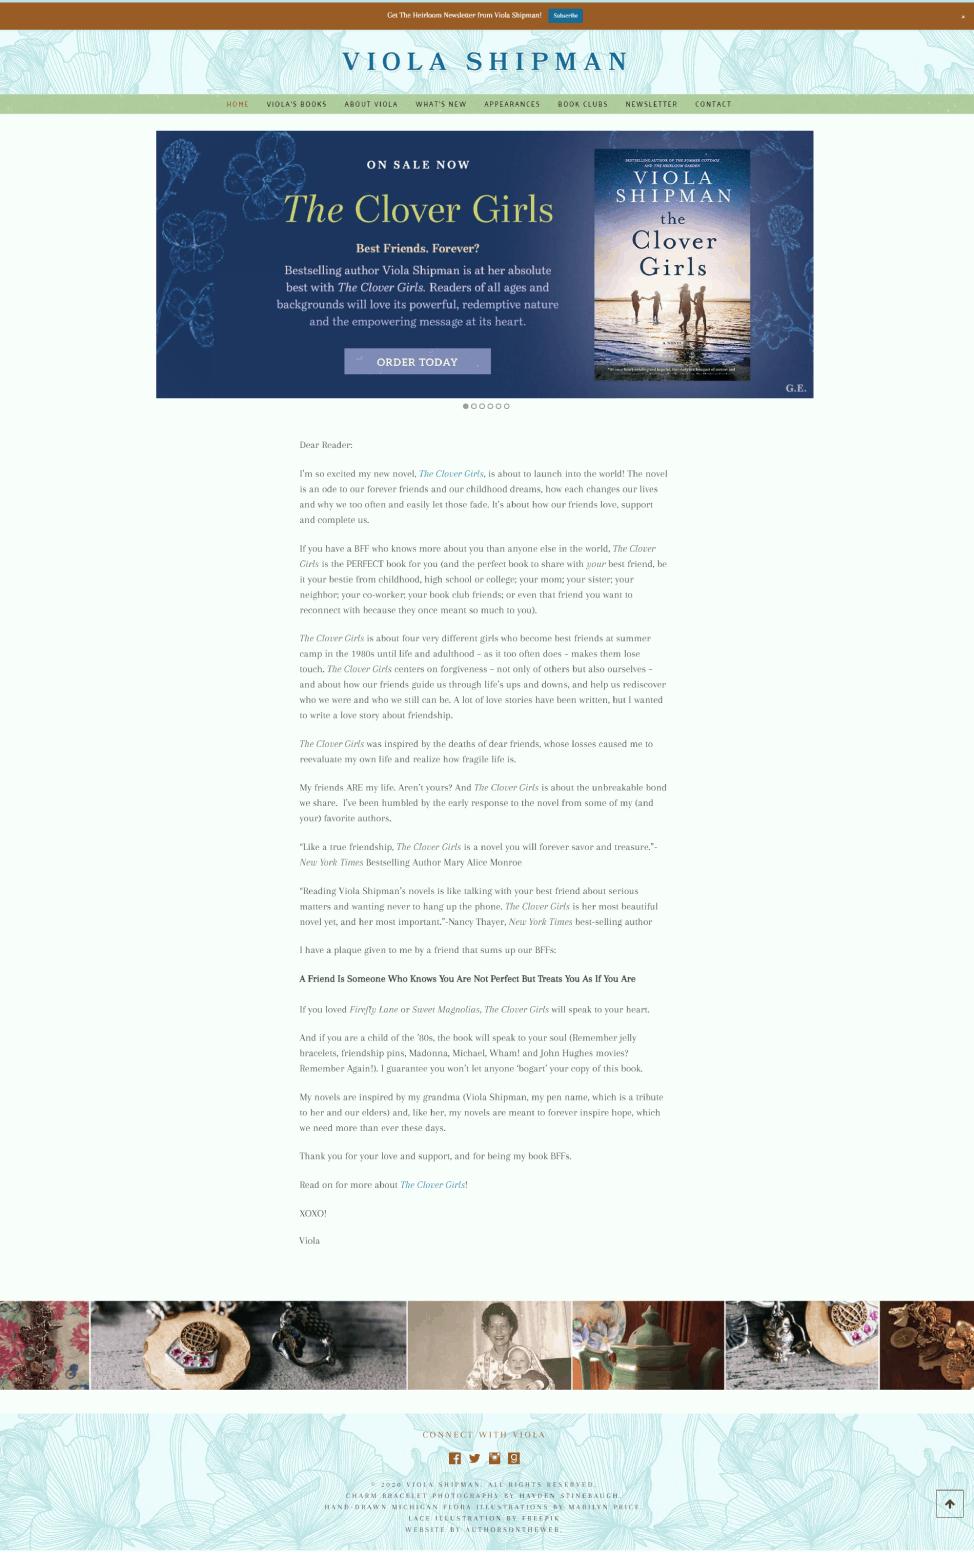 Viola Shipman 2021 Update